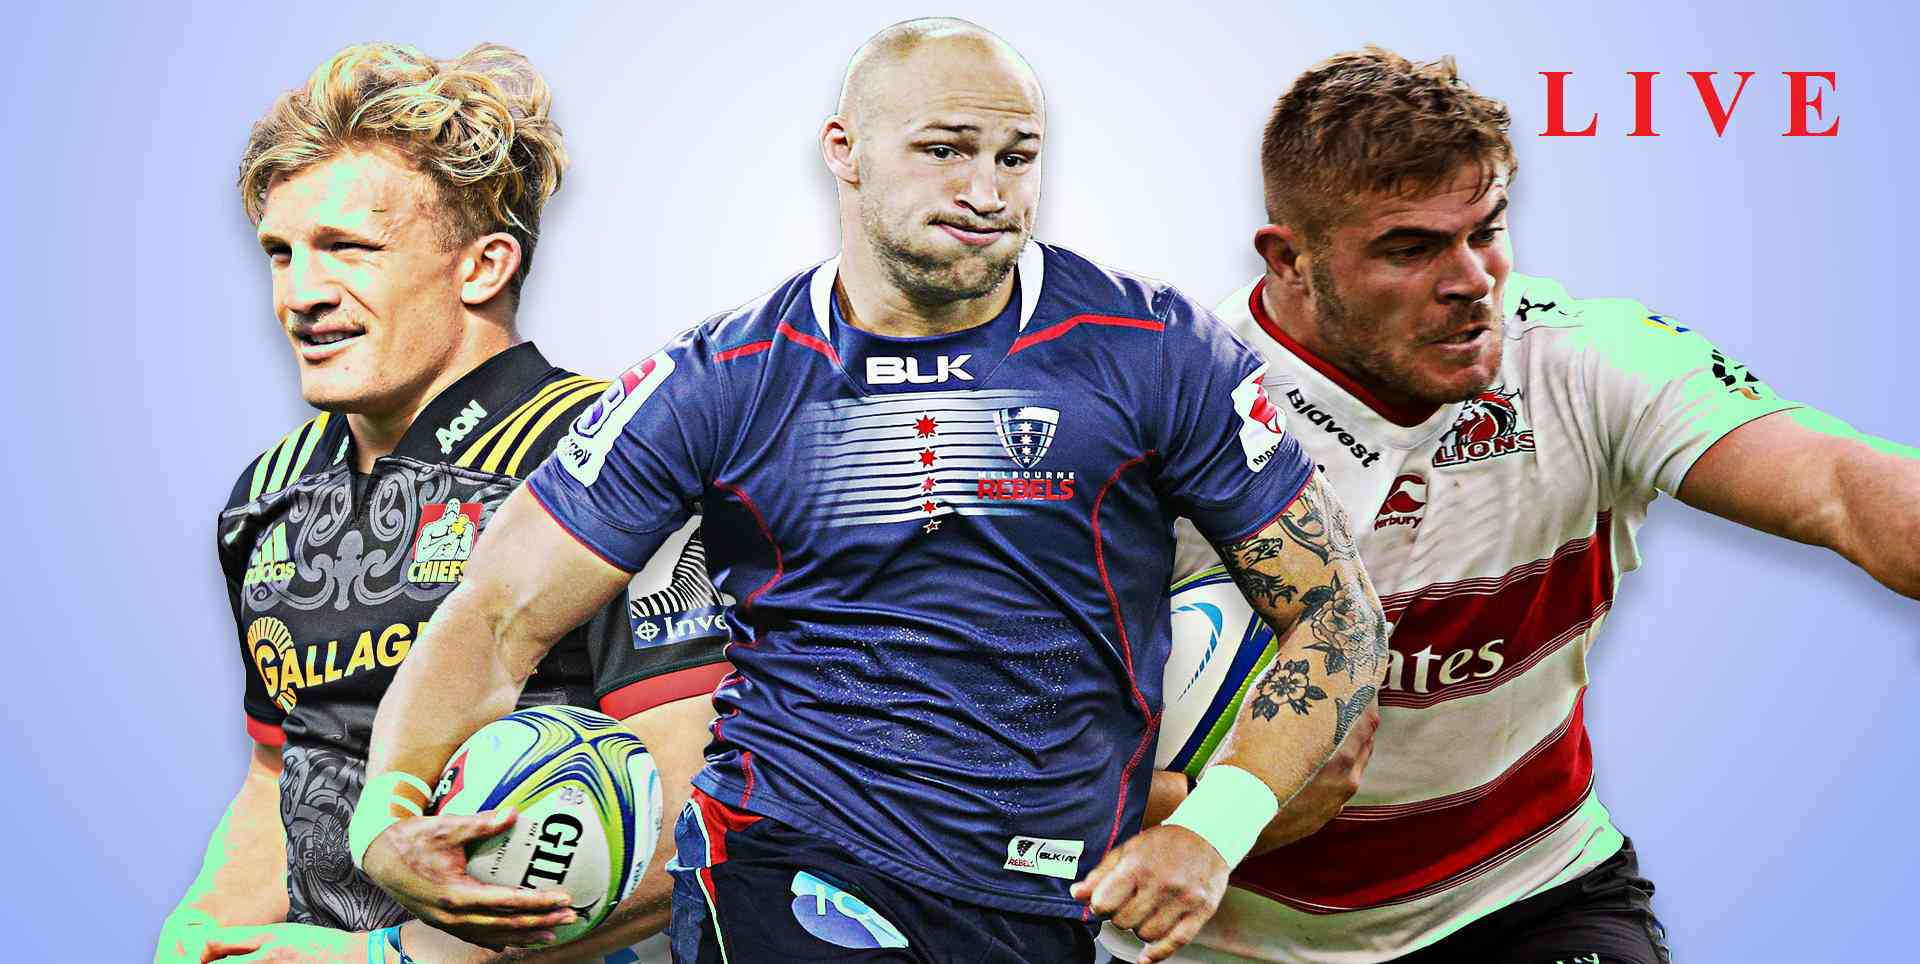 live-rugby-ulster-vs-harlequins